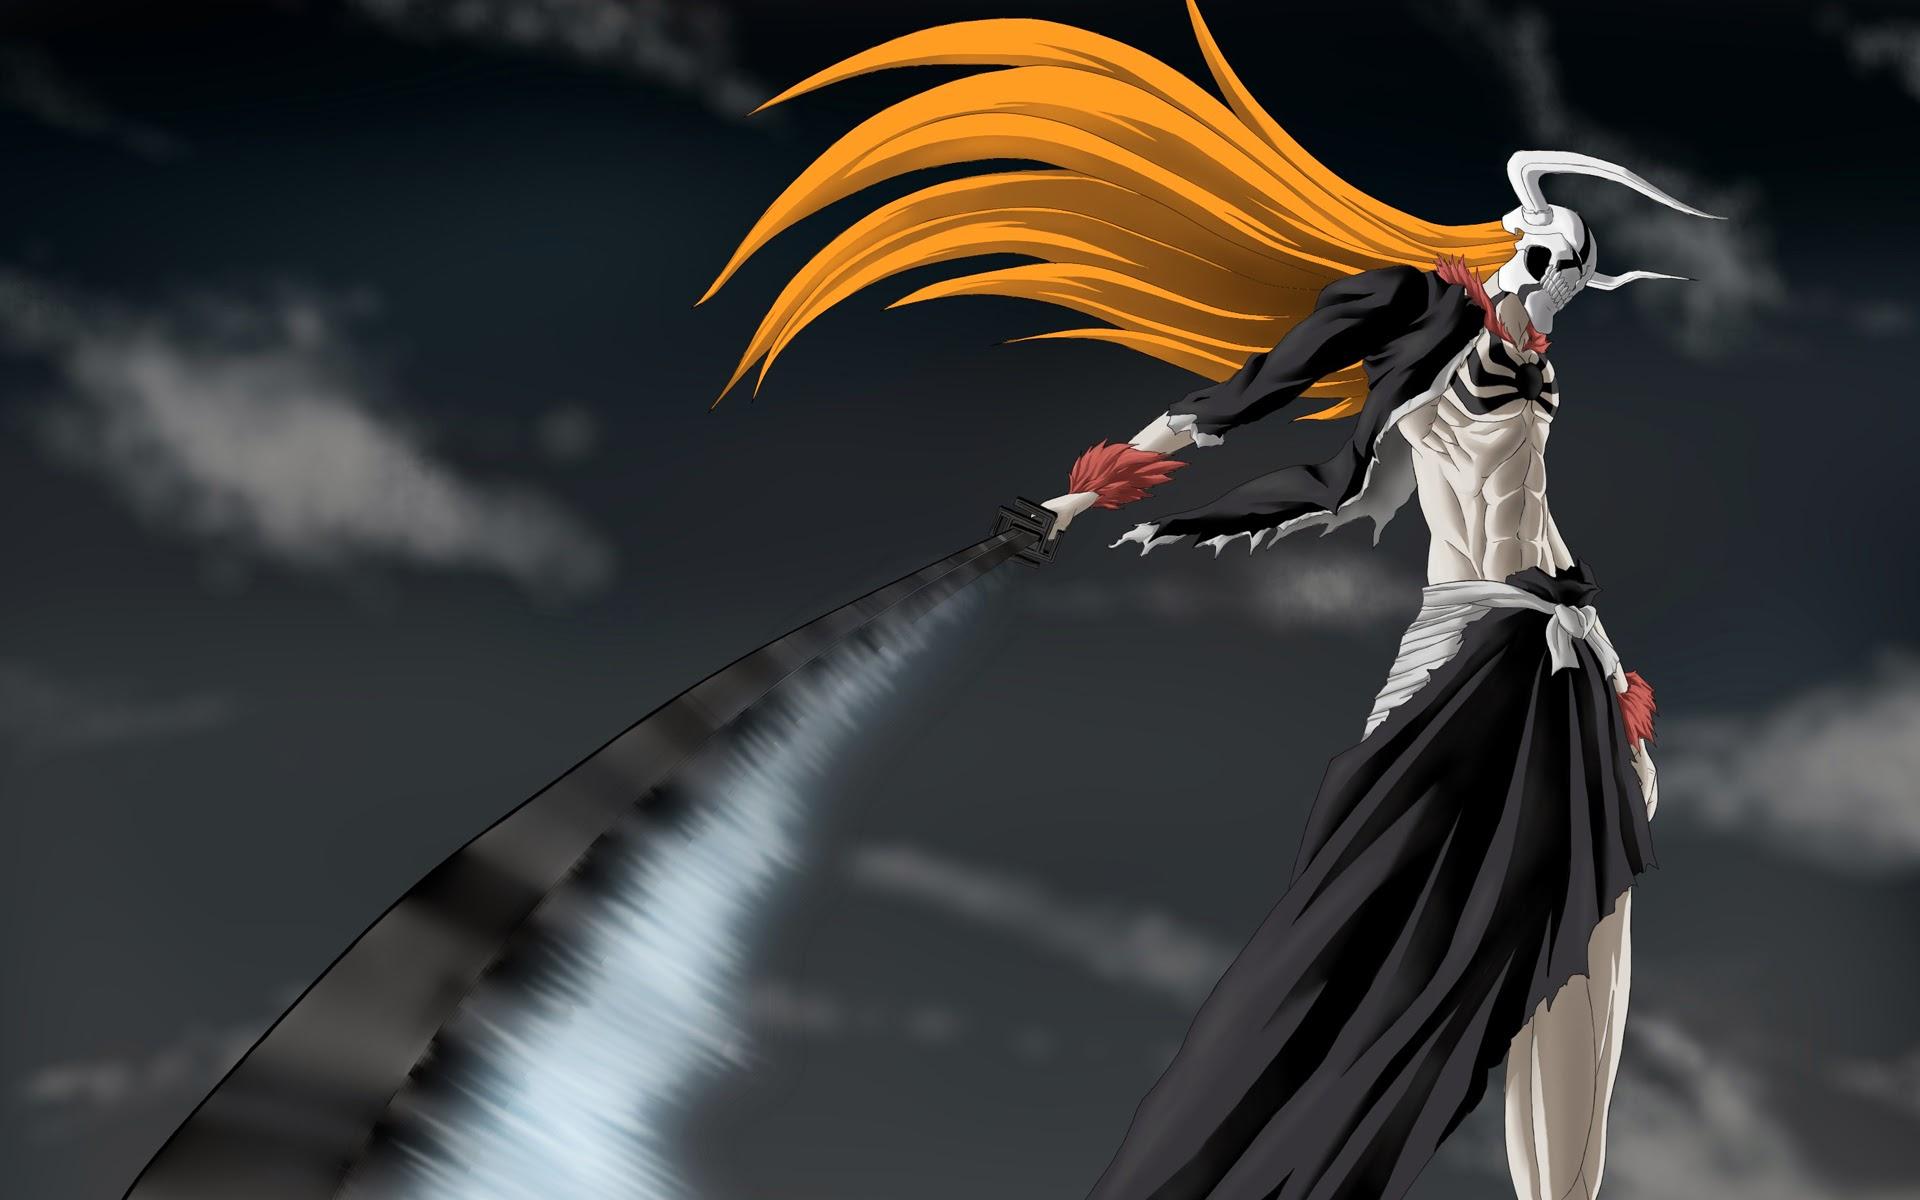 Bleach Ichigo Wallpaper - WallpaperSafari